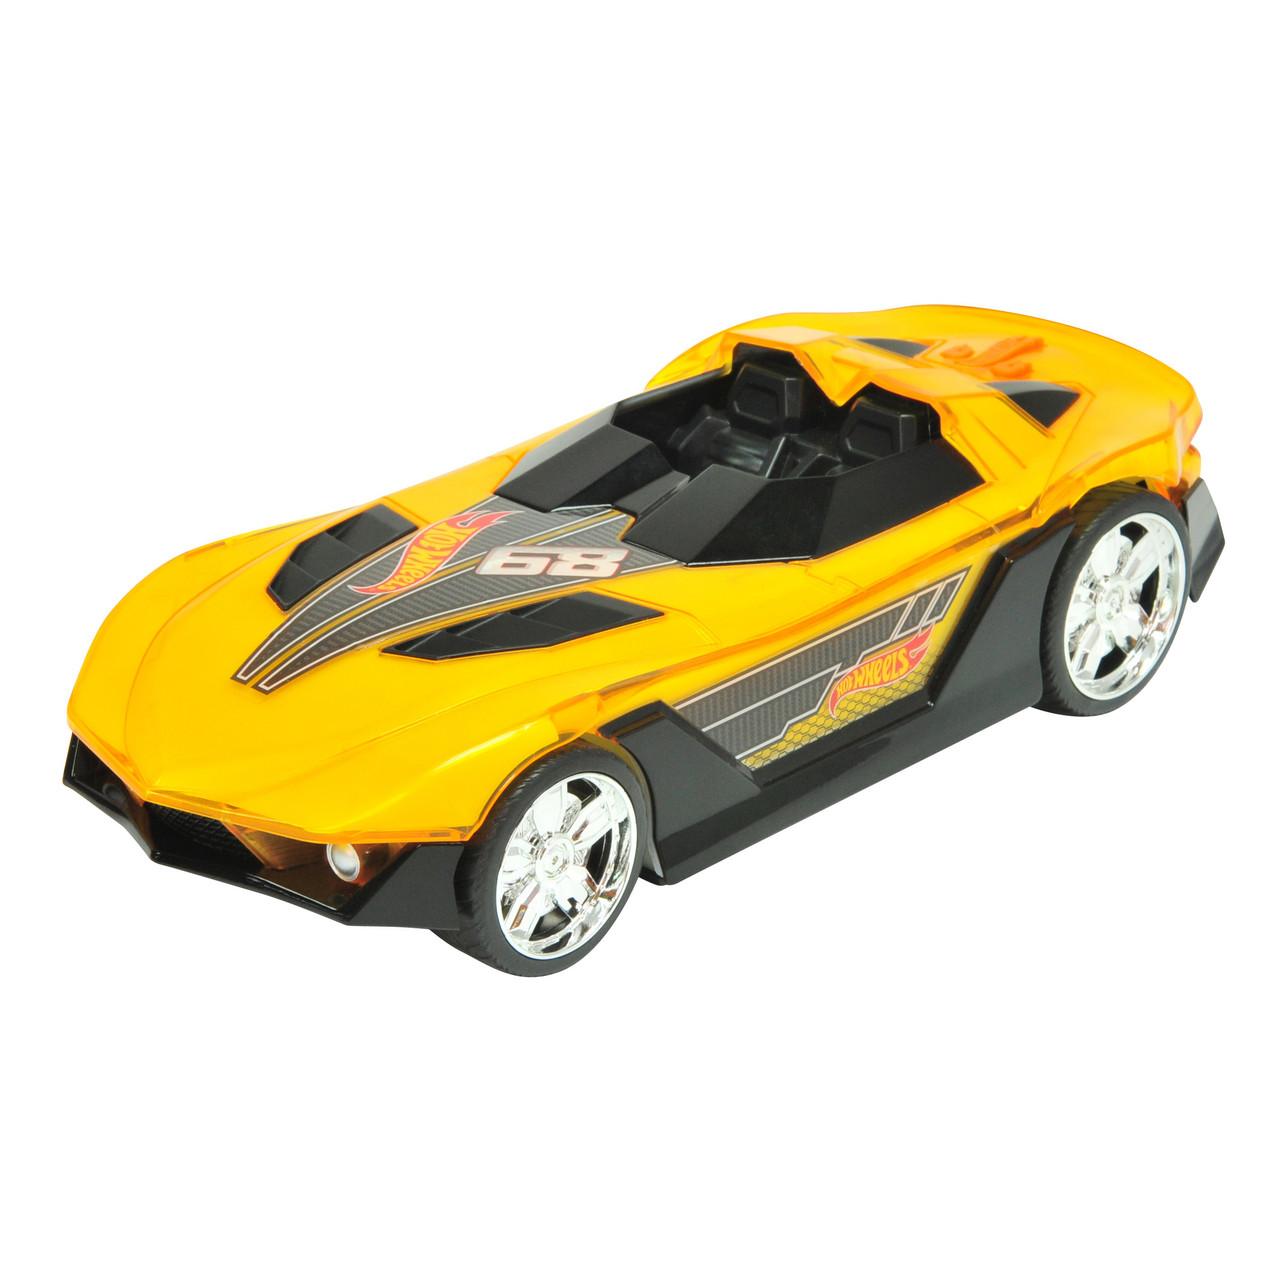 Супер гонщик Yur So Fast, 25 см «Toy State» (90531)